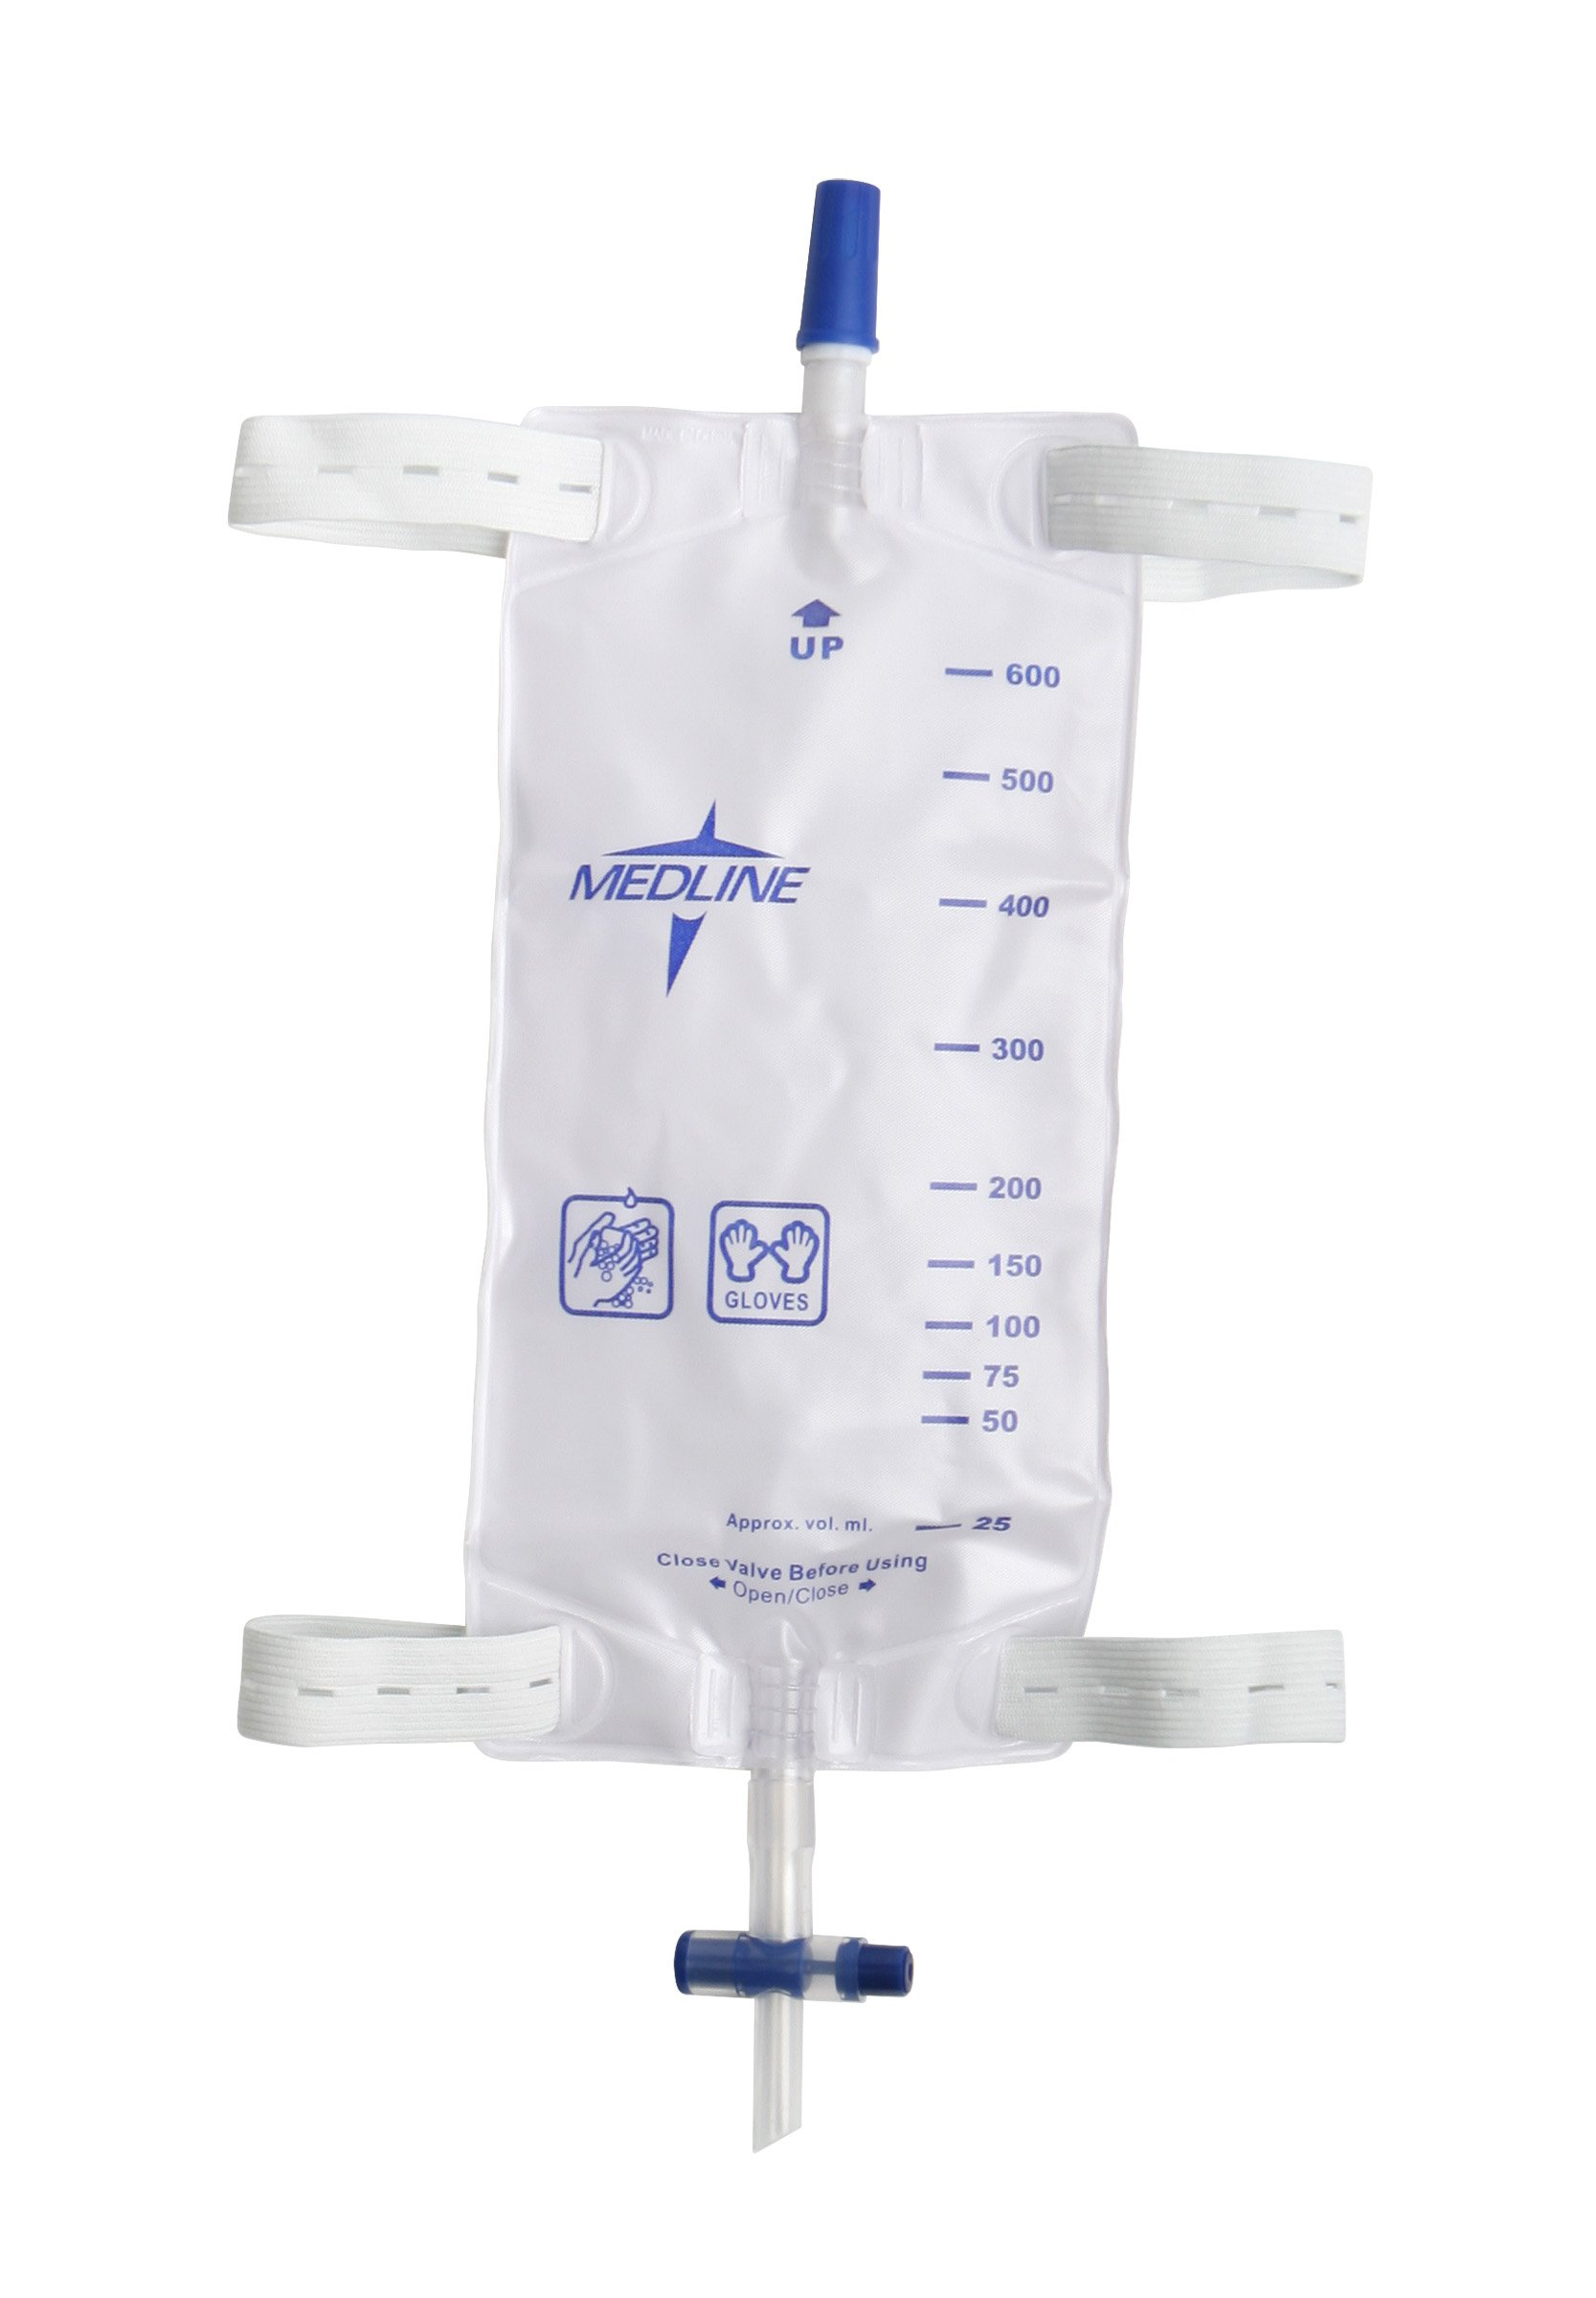 Medline DYND12584 Leg Bags with Slide Tap, 19 Ounce Capacity, Medium (Pack of 48)